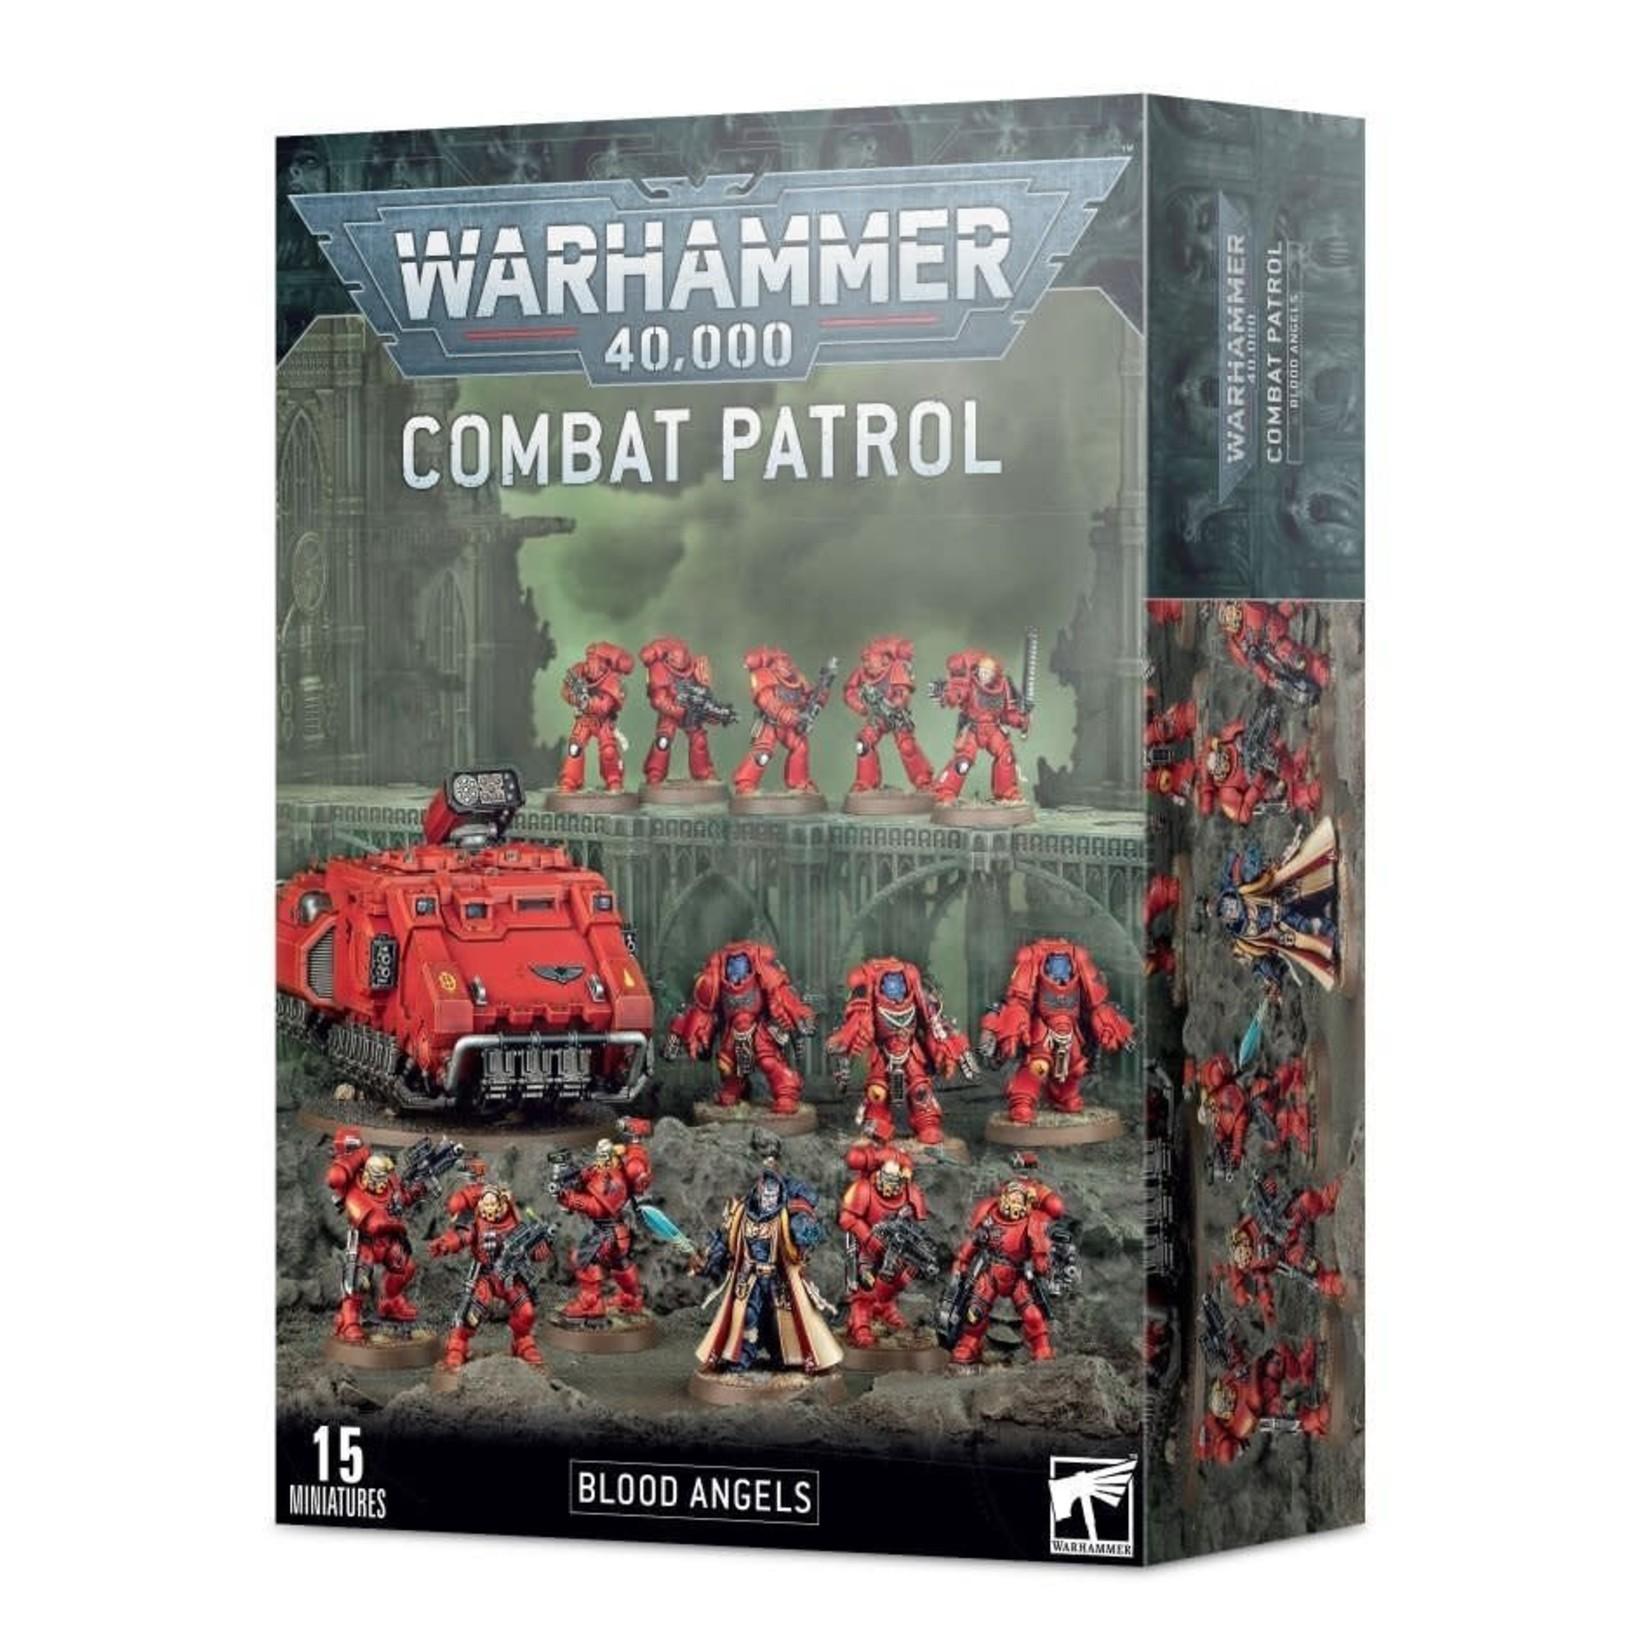 Games Workshop Warhammer 40k: Combat Patrol - Blood Angels